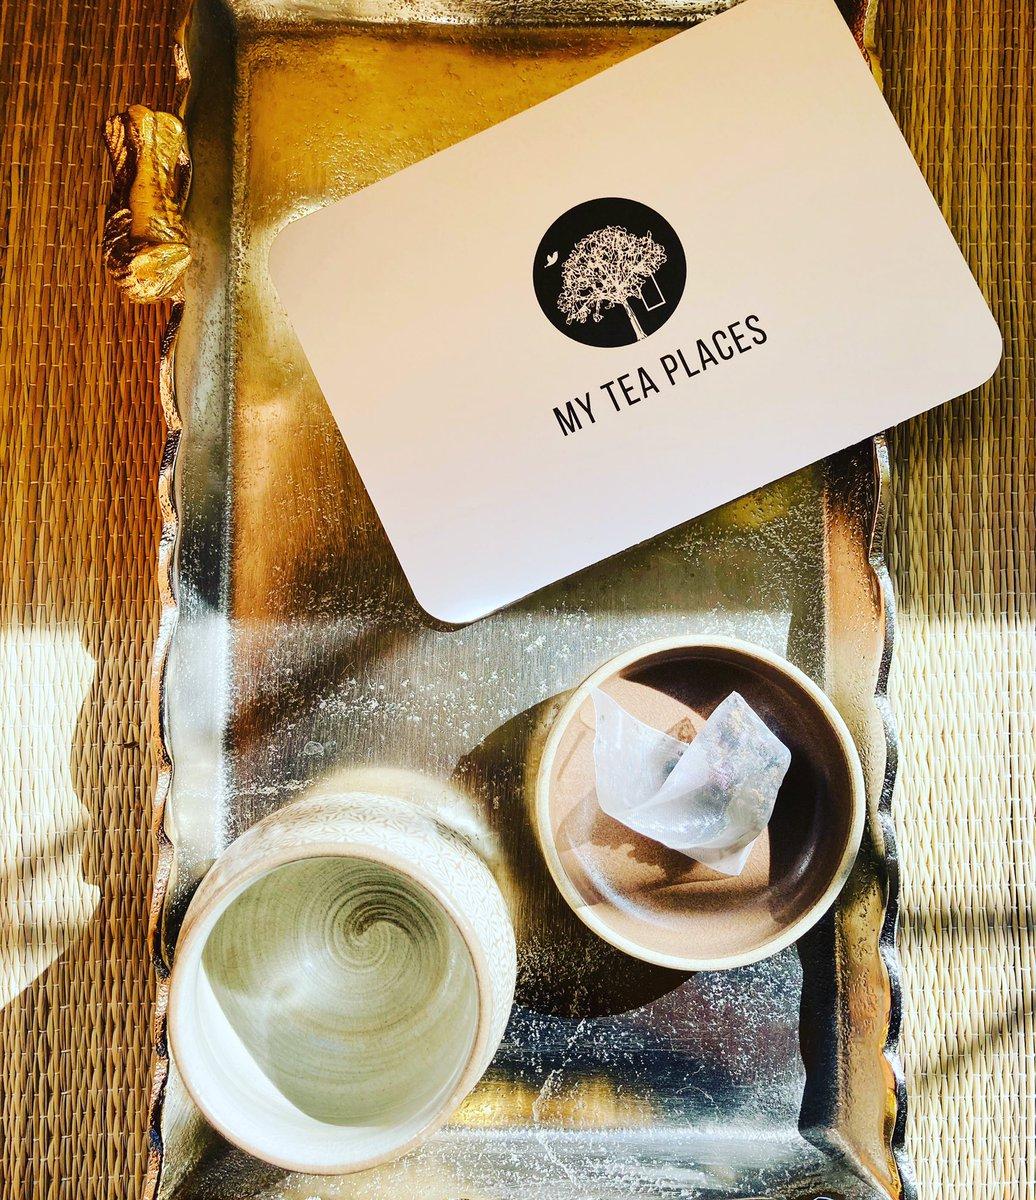 Good morning! ☀️ We hope your day is wonderful 🍵 🍃.   🗺  #tea #myteaplaces #oolong #tuesdayvibe #tuesdaymotivations #goodmorning